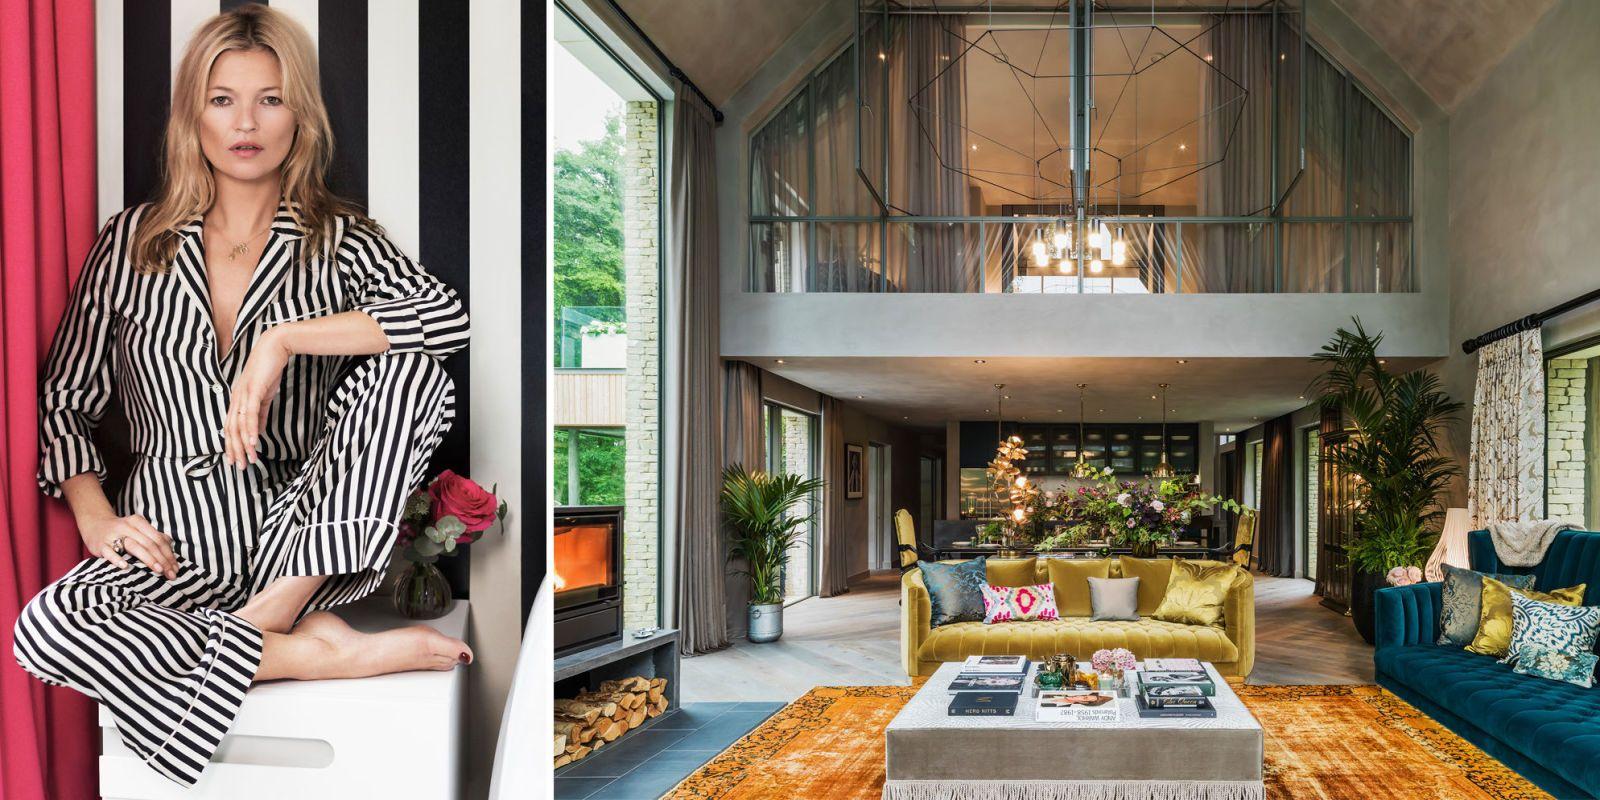 Kate Moss Does Interior DesignKate Moss is an Interior Designer